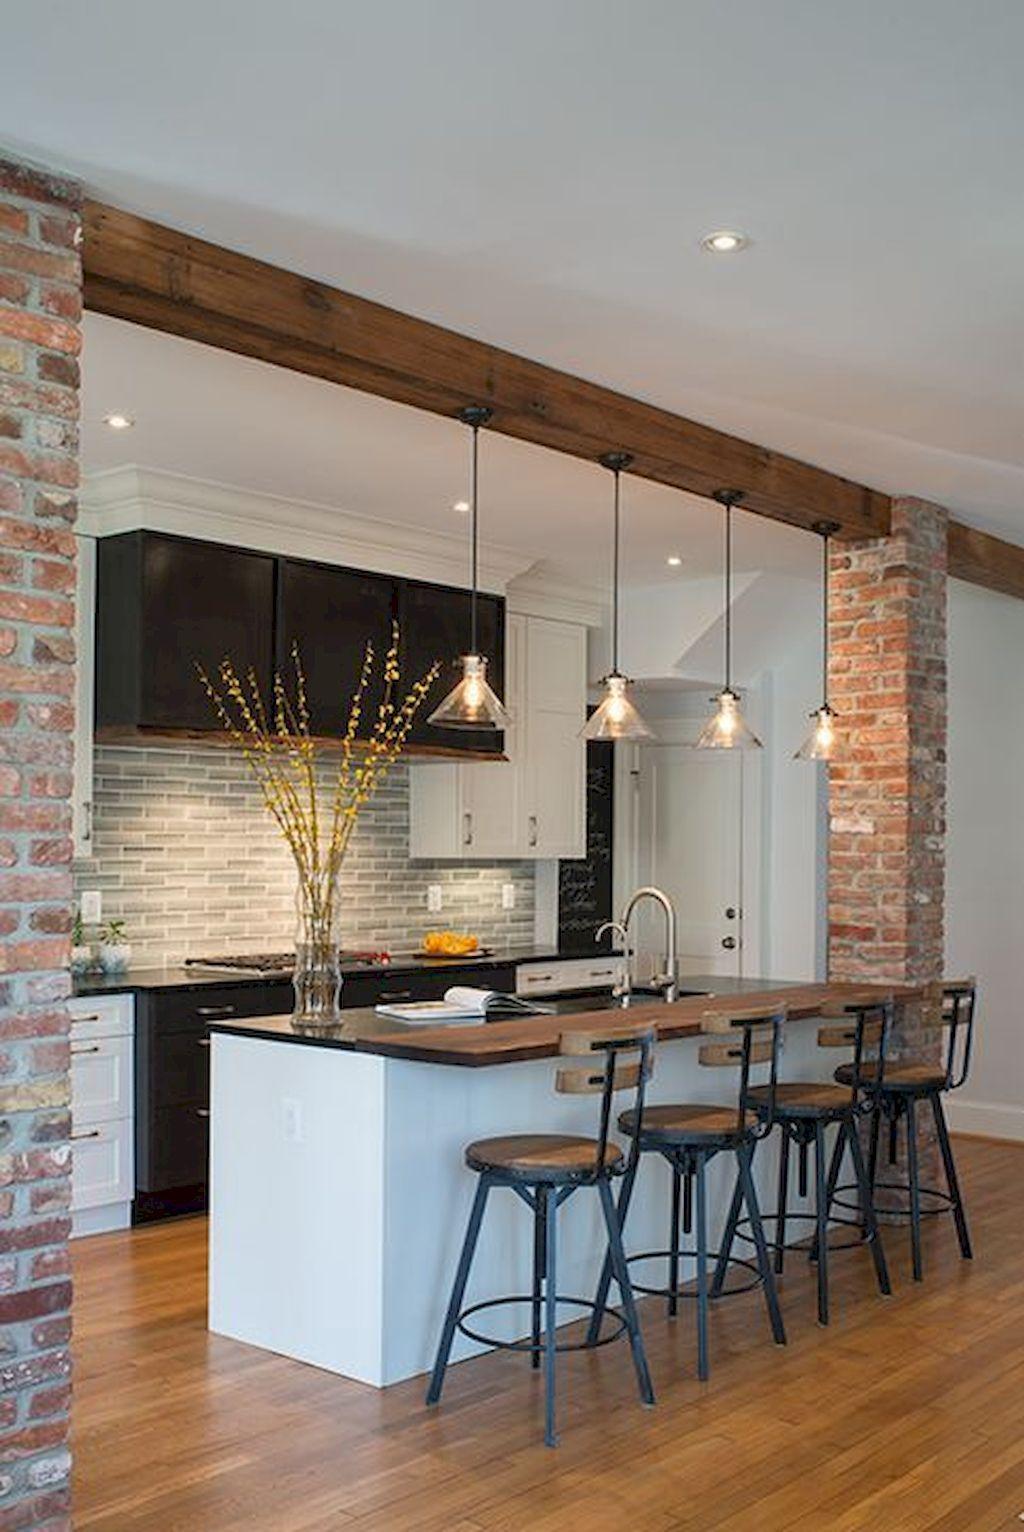 Eco friendly kitchen tile design ideas also illuminating lighting for  beautiful kitchens rh pinterest